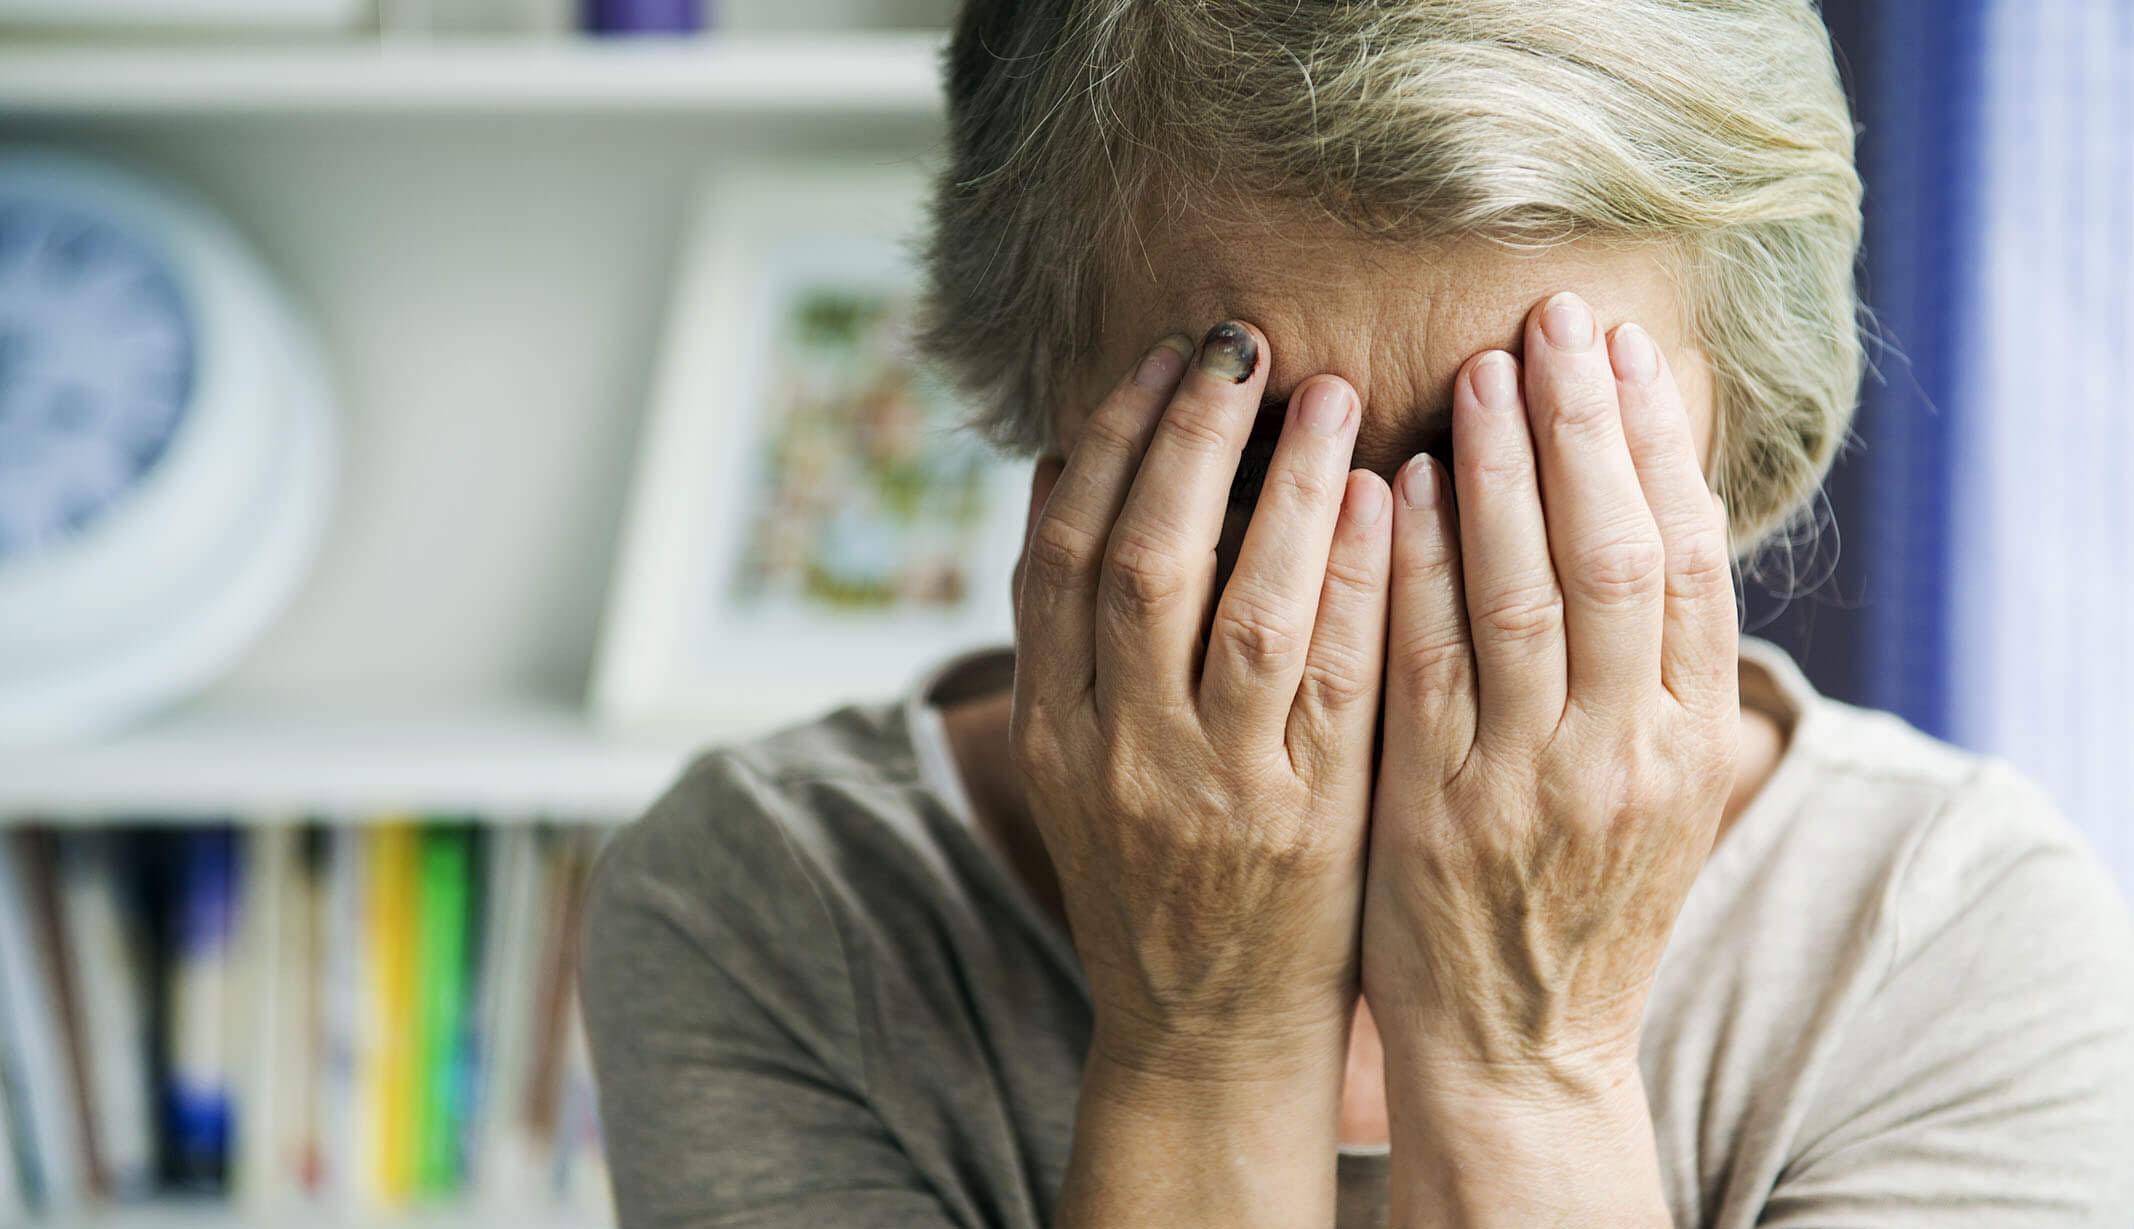 Idős nőt zaklattak